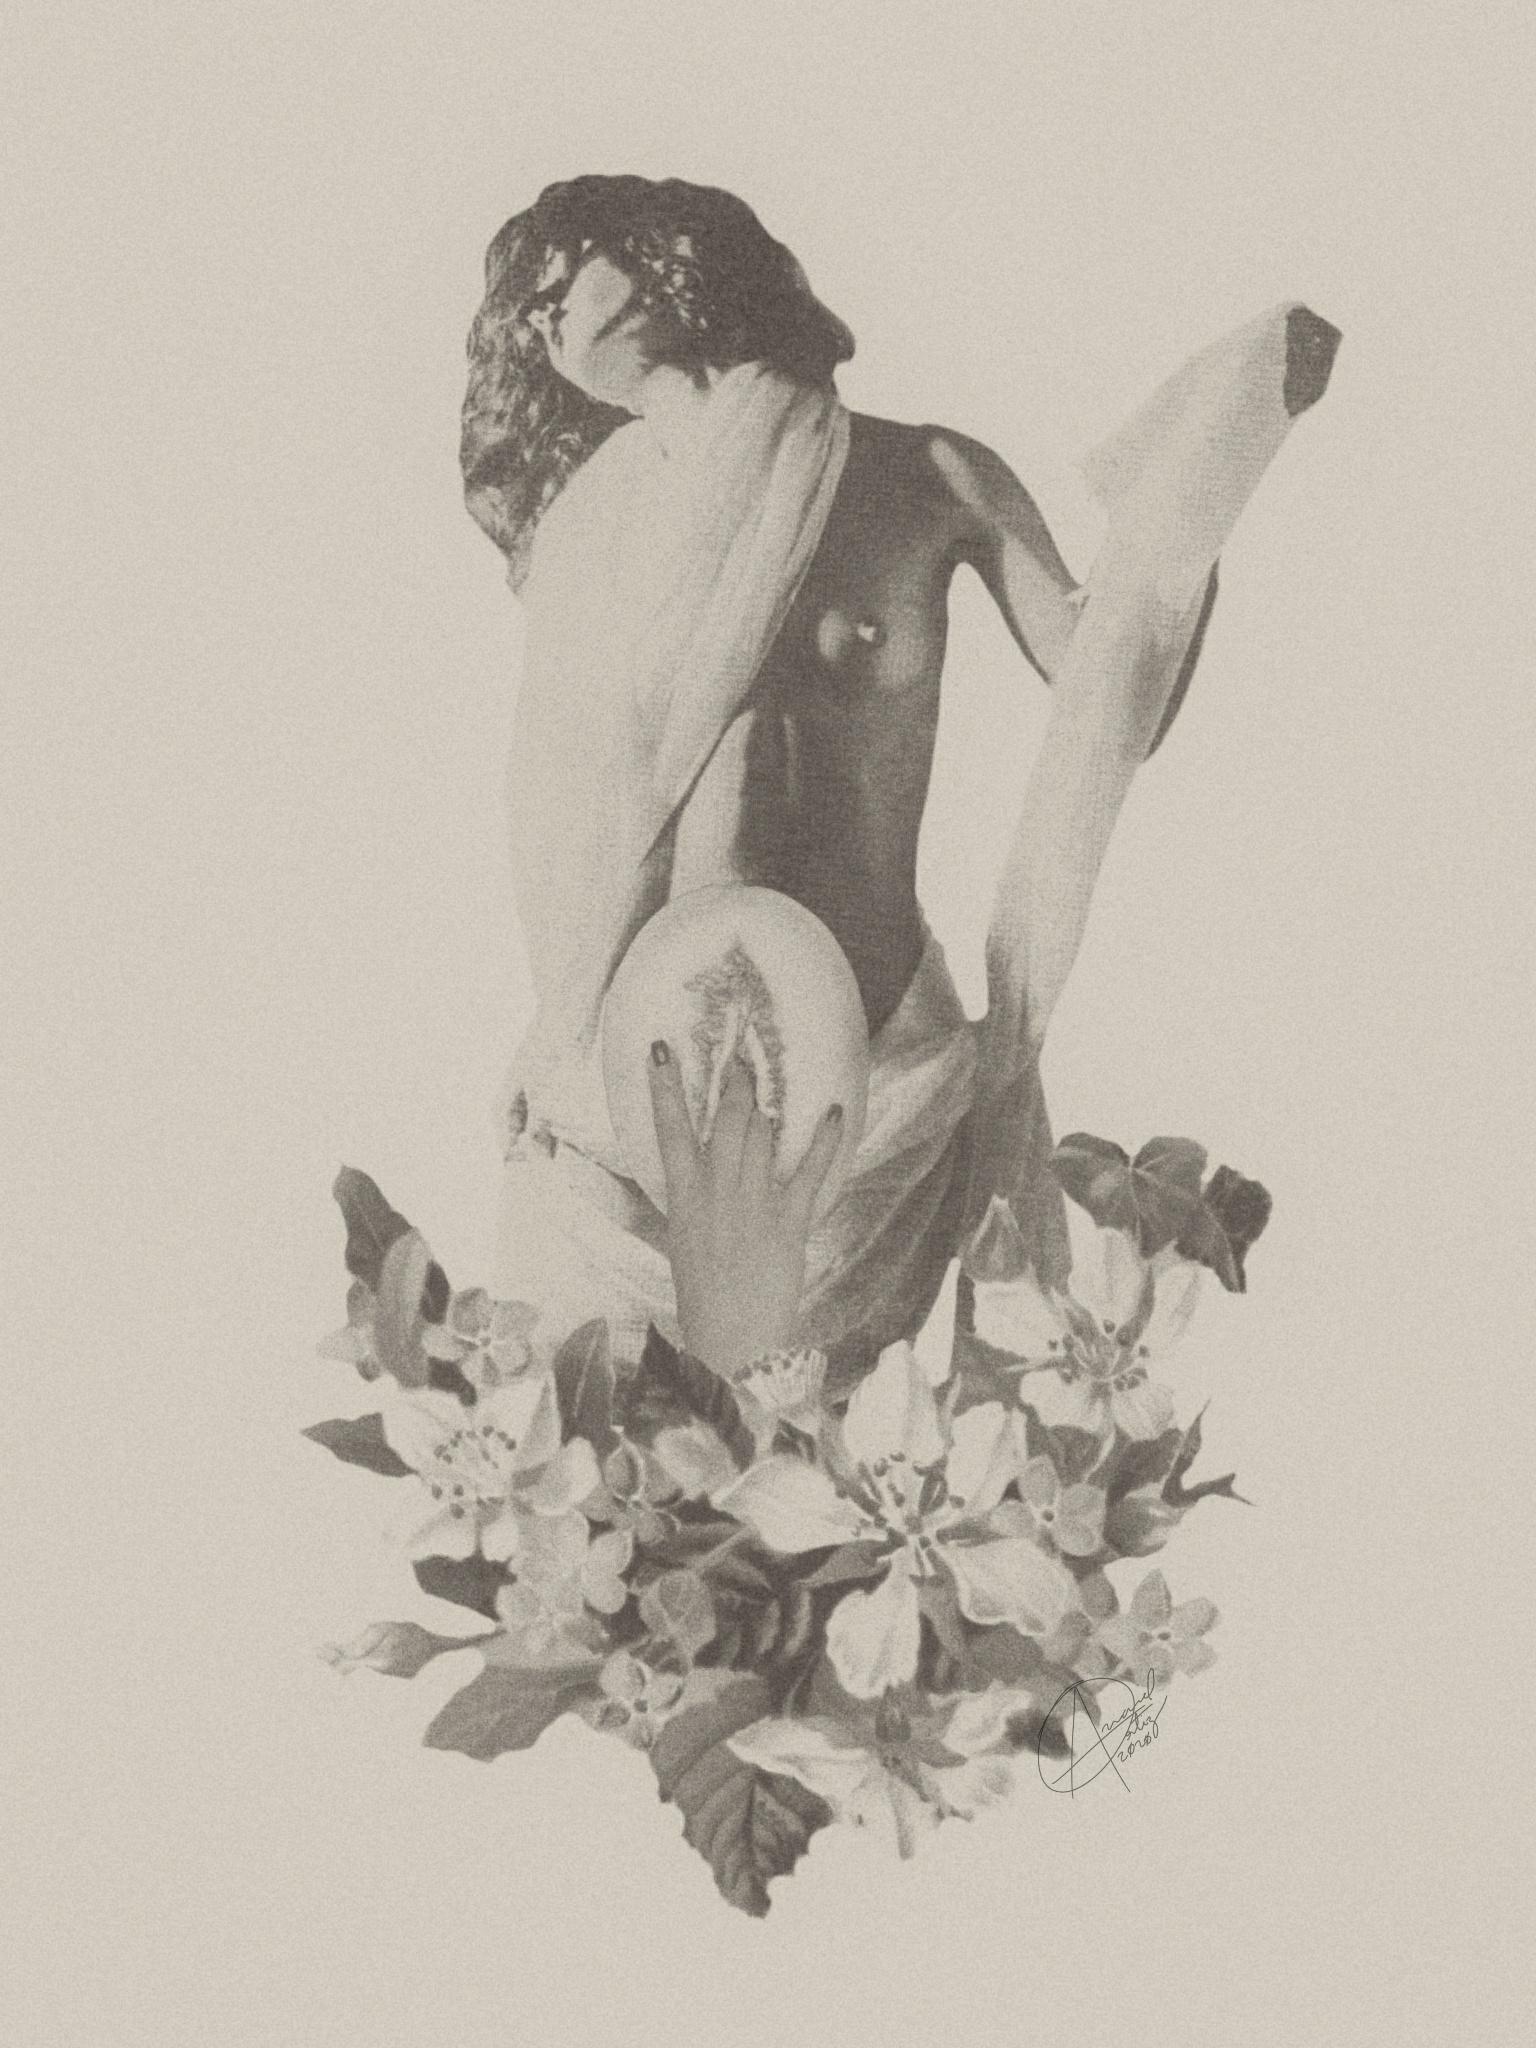 Collage por Anaid Ortiz desde Guanajuato, México